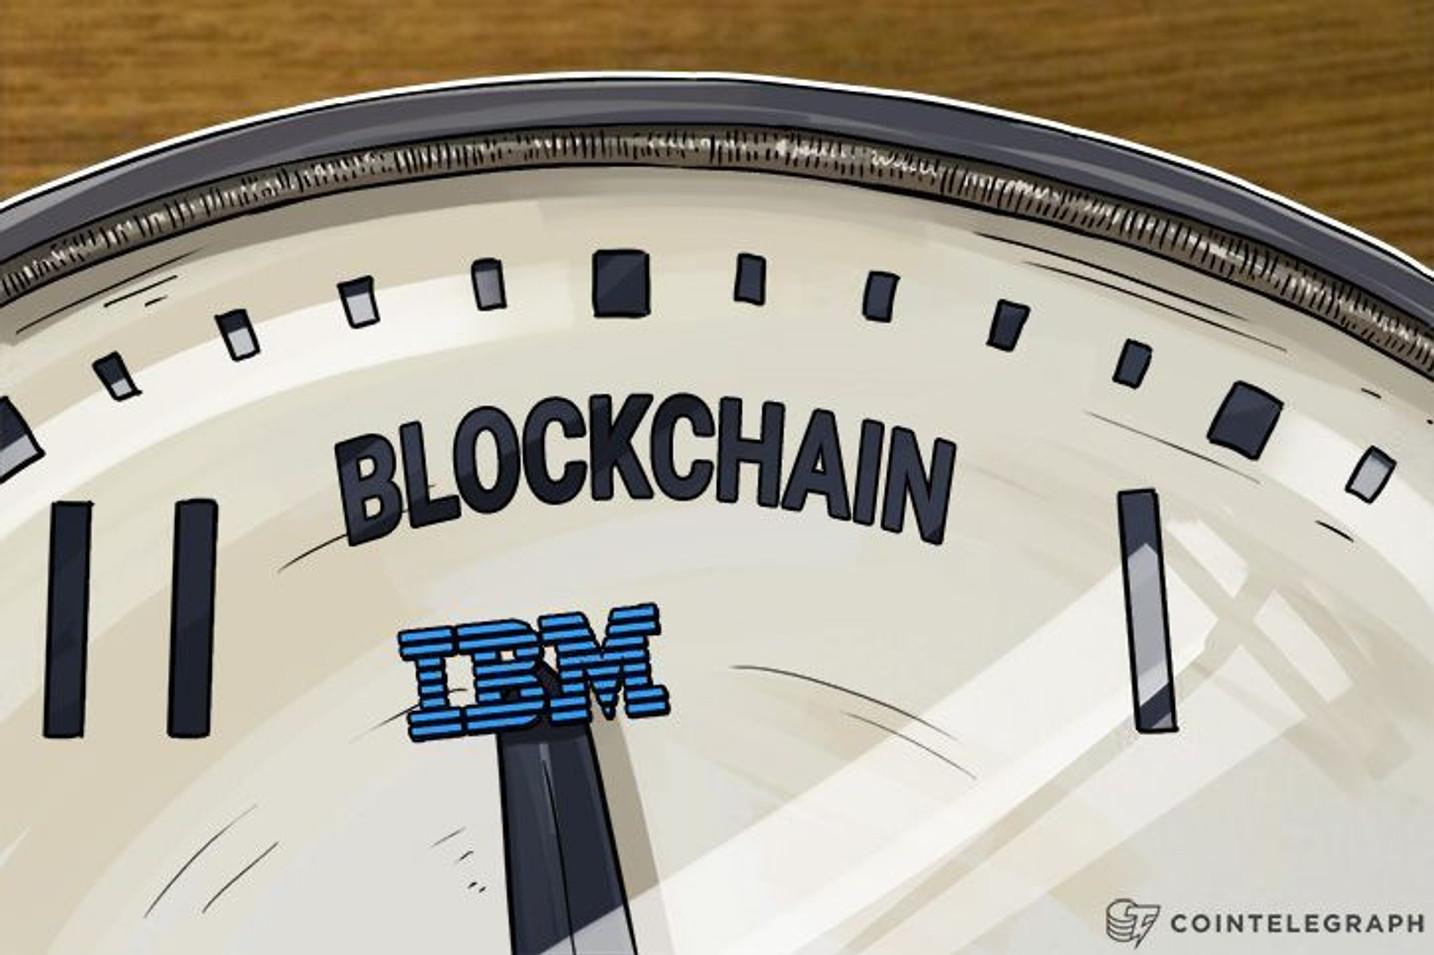 Thai Bank, IBM Complete Joint Blockchain Pilot to Augment Contract Management Process